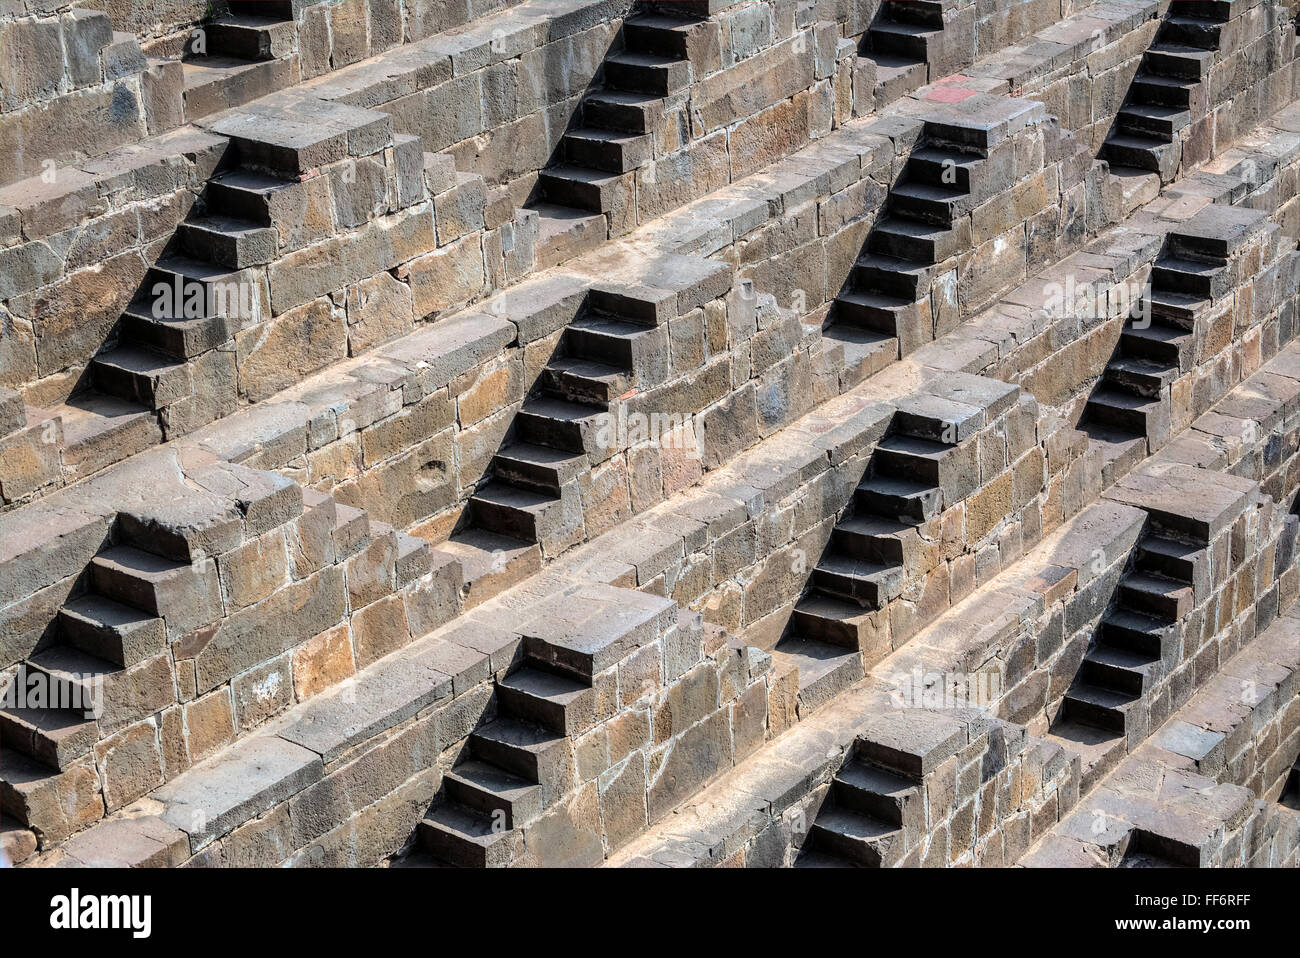 Chand Baori stepwell, Abhaneri, Dausa, Rajasthan, India - Stock Image